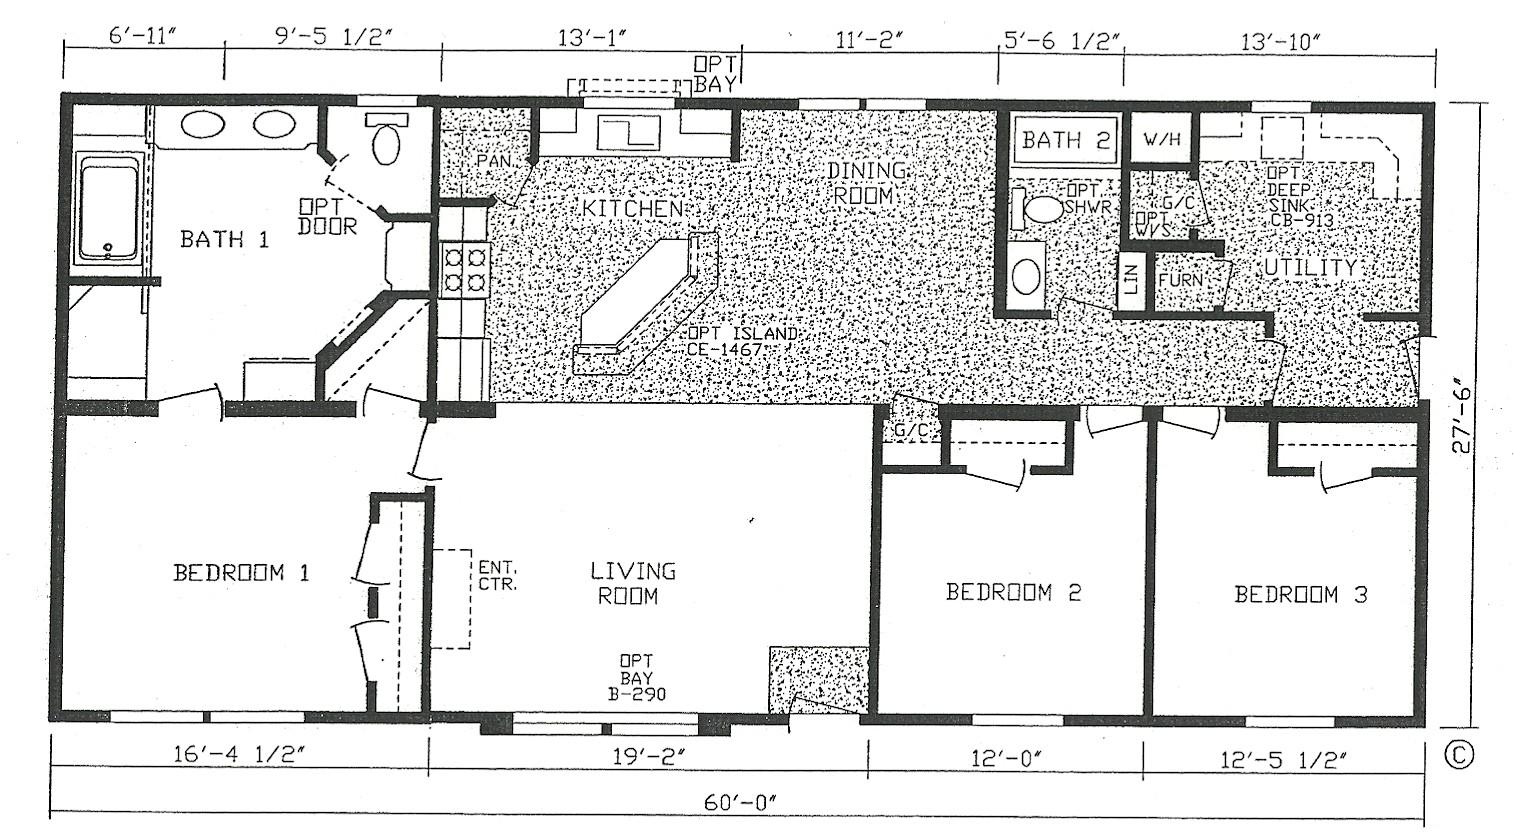 3 bedroom modular home plans